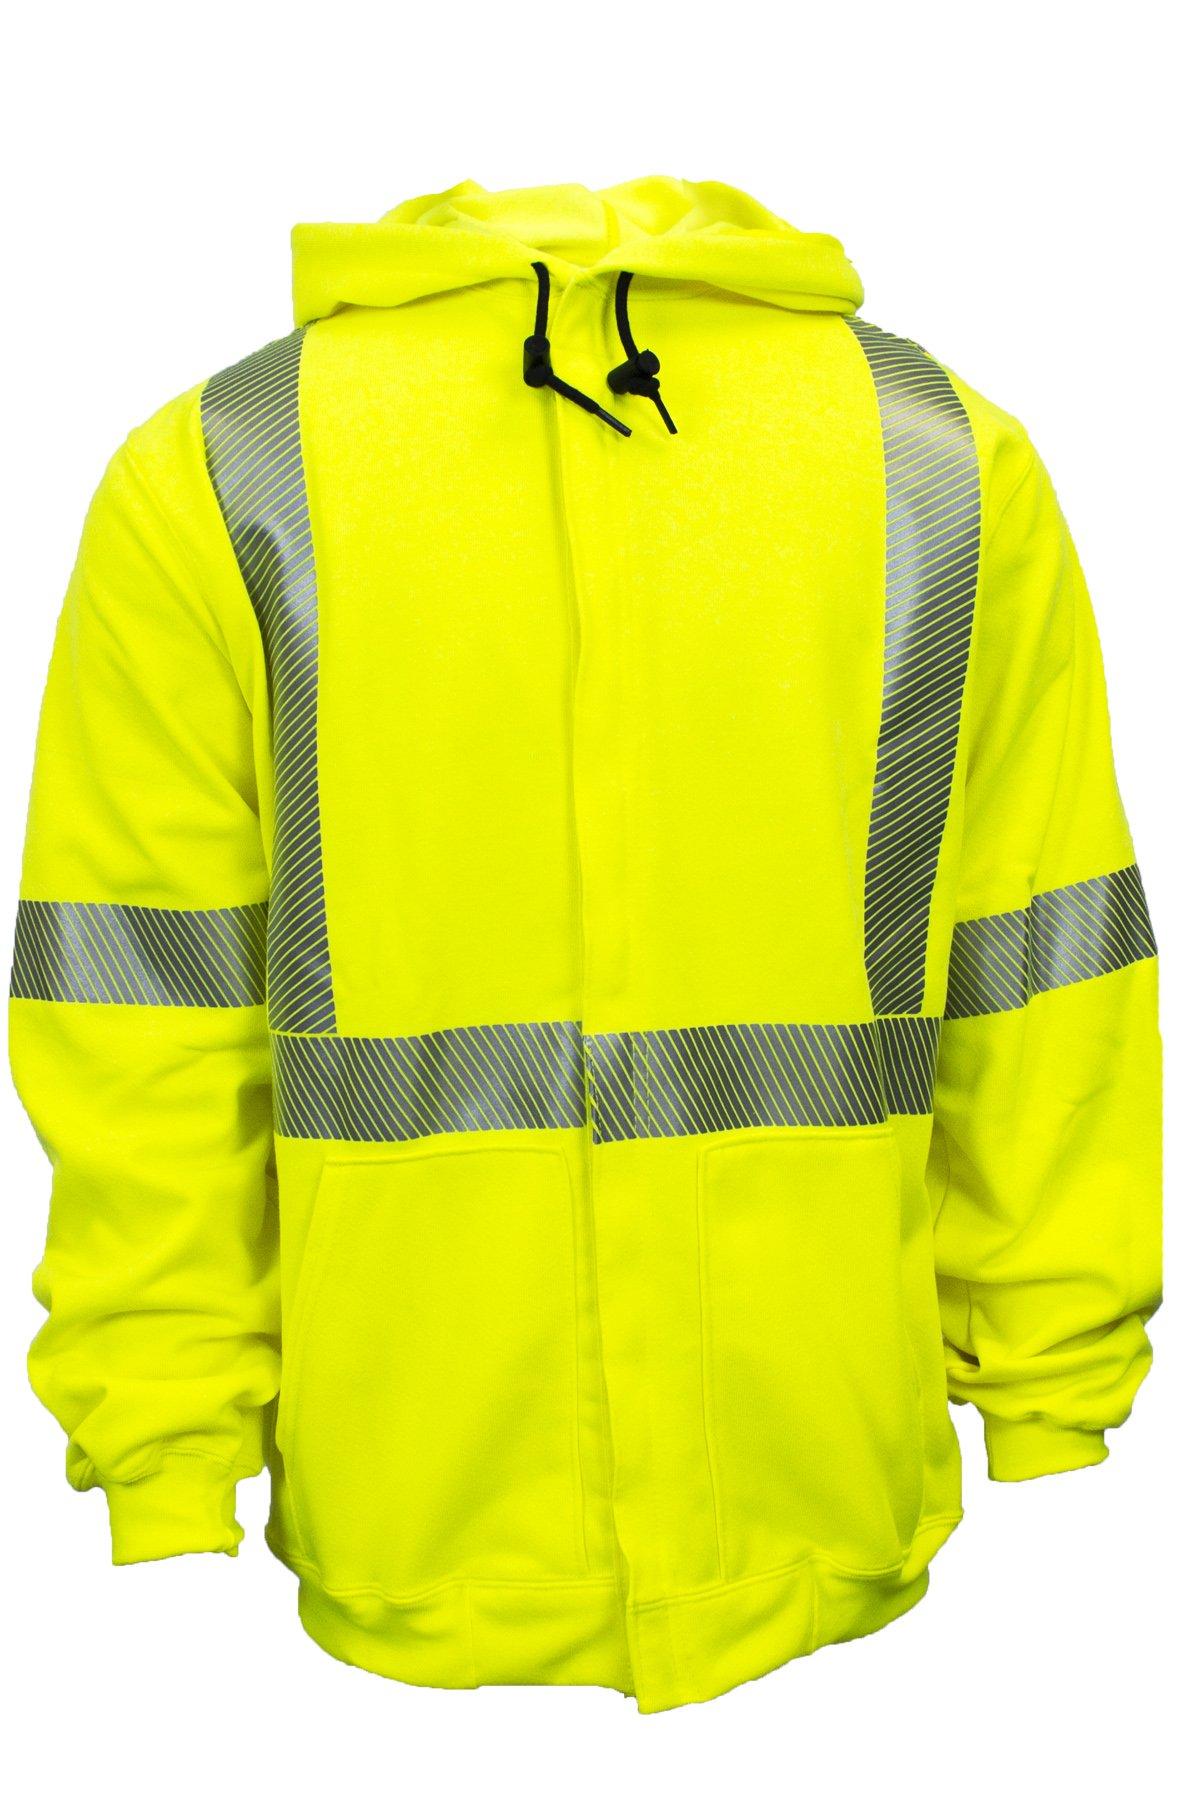 National Safety Apparel C21HC05C3XL Class 3 FR Hi-Vis Hooded Zip Front Sweatshirt, X-Large, Fluorescent Yellow